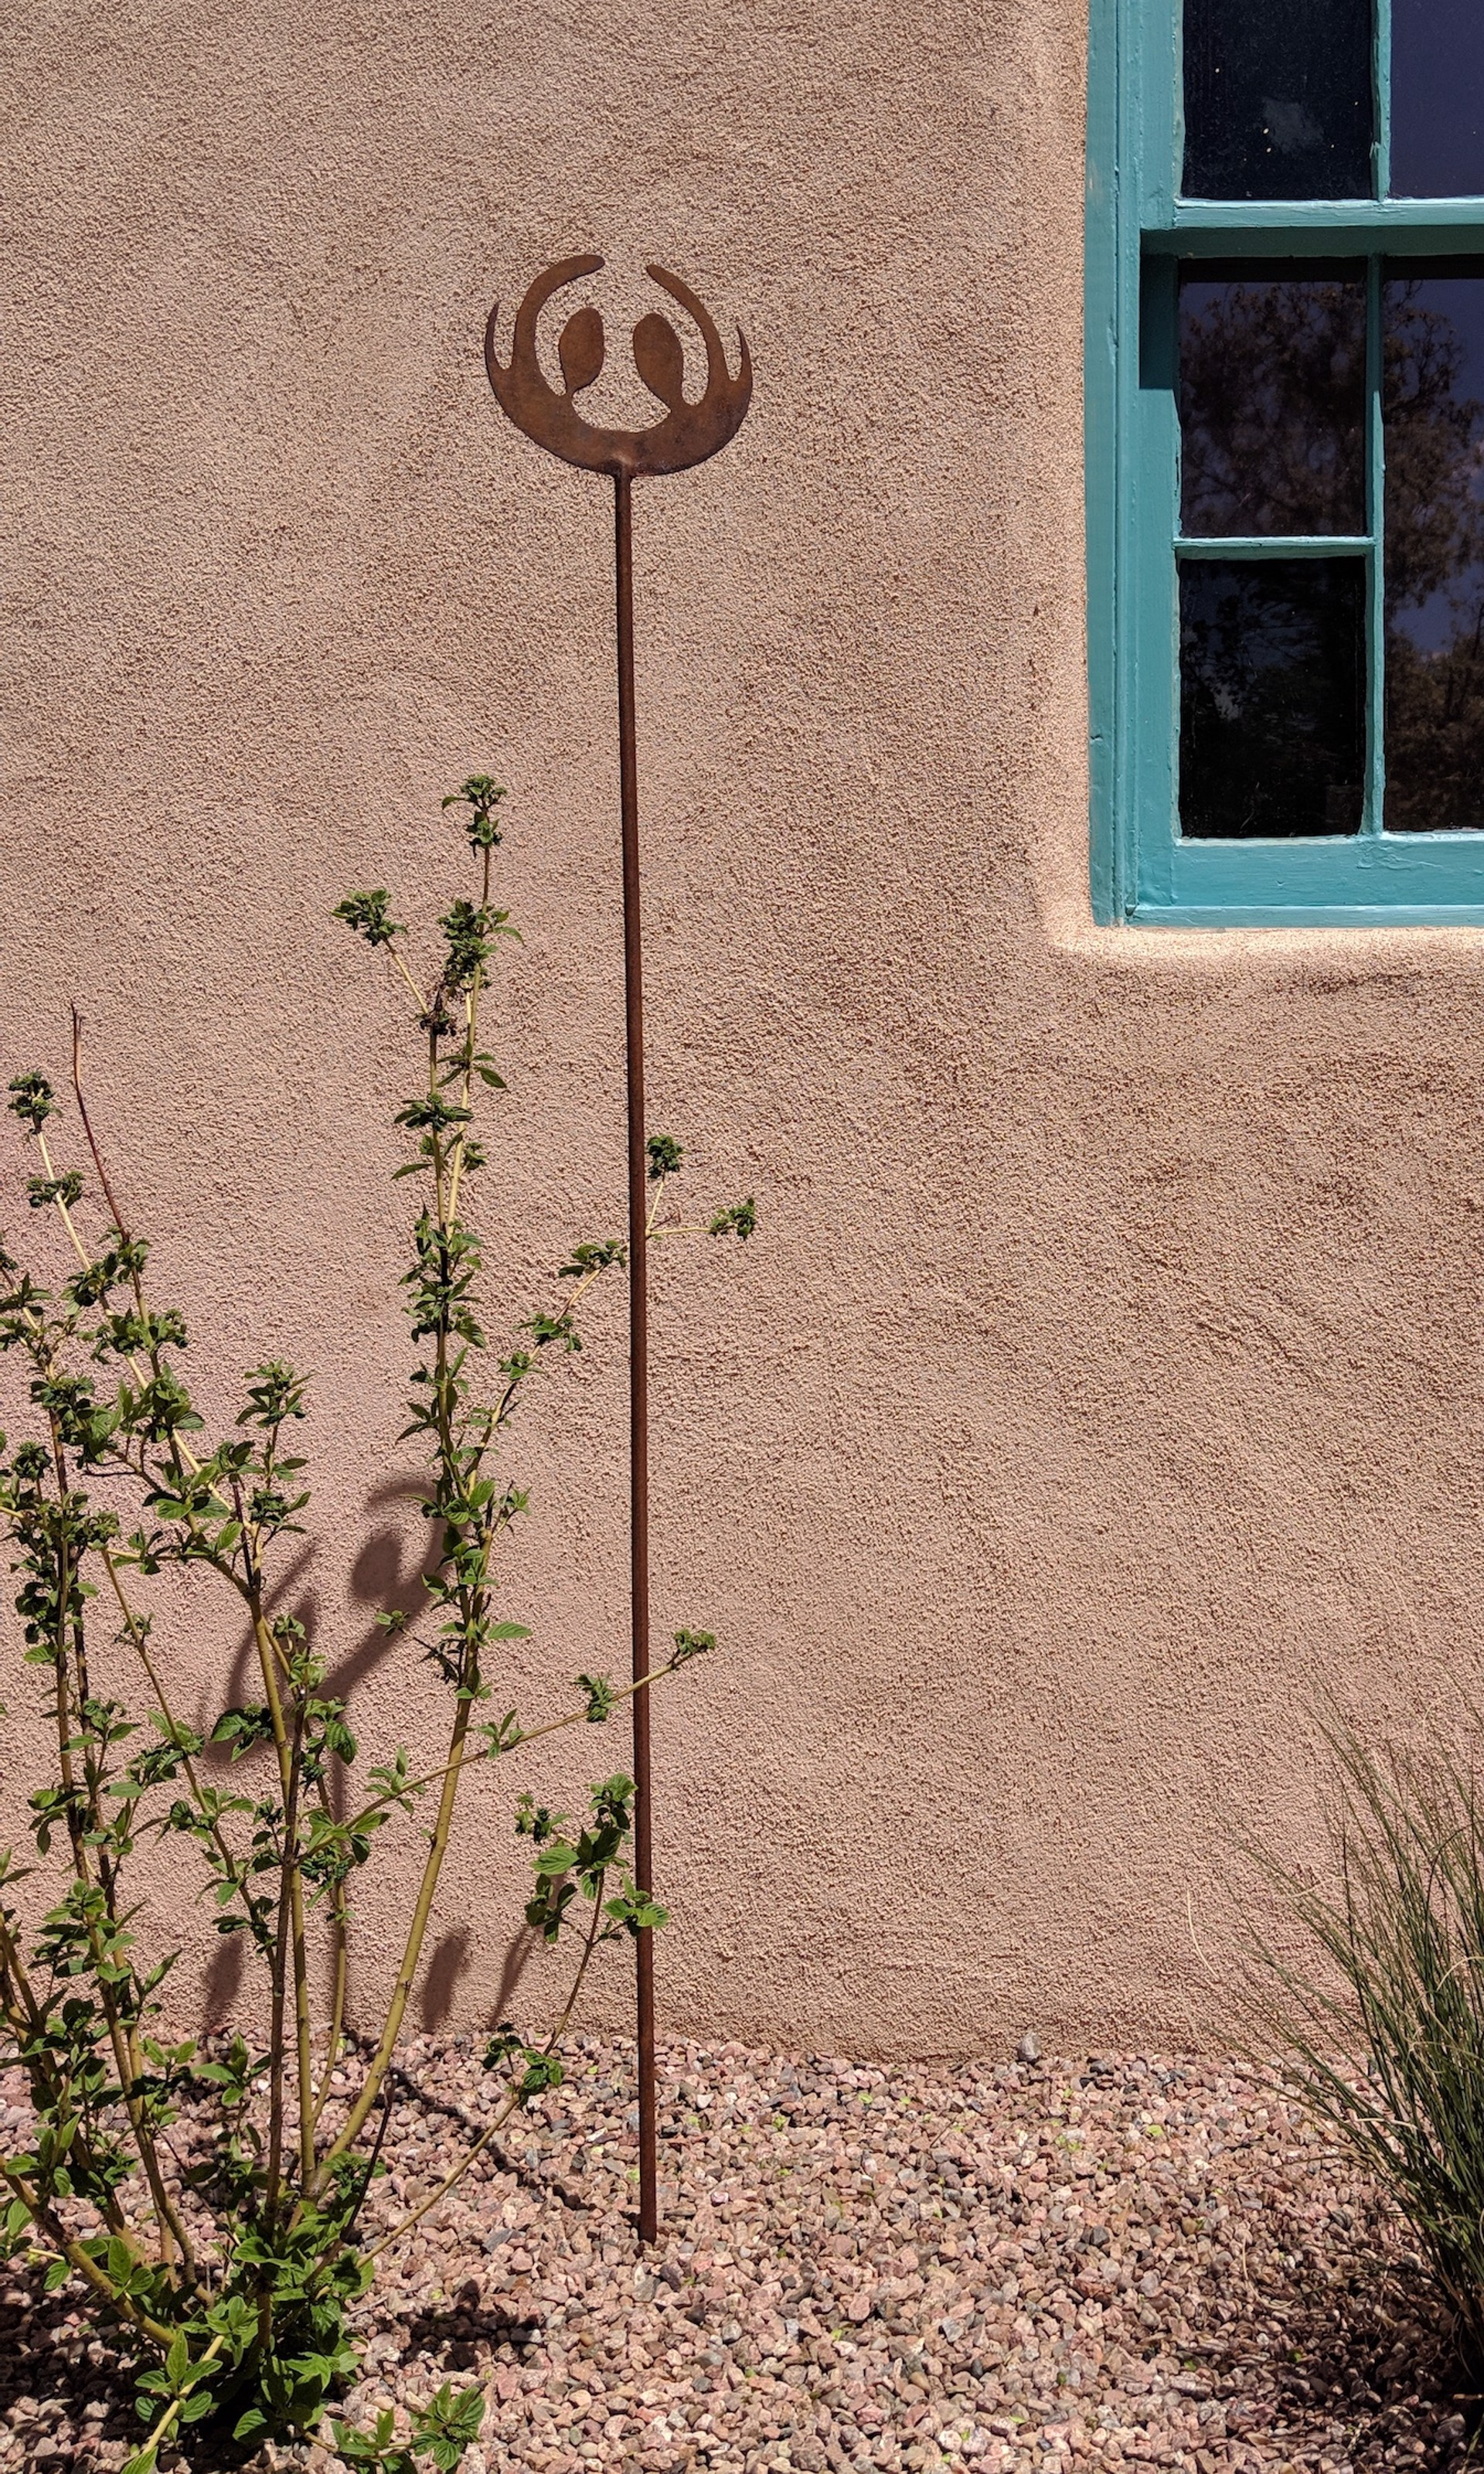 Lilac Bud 1 by Susan Latham